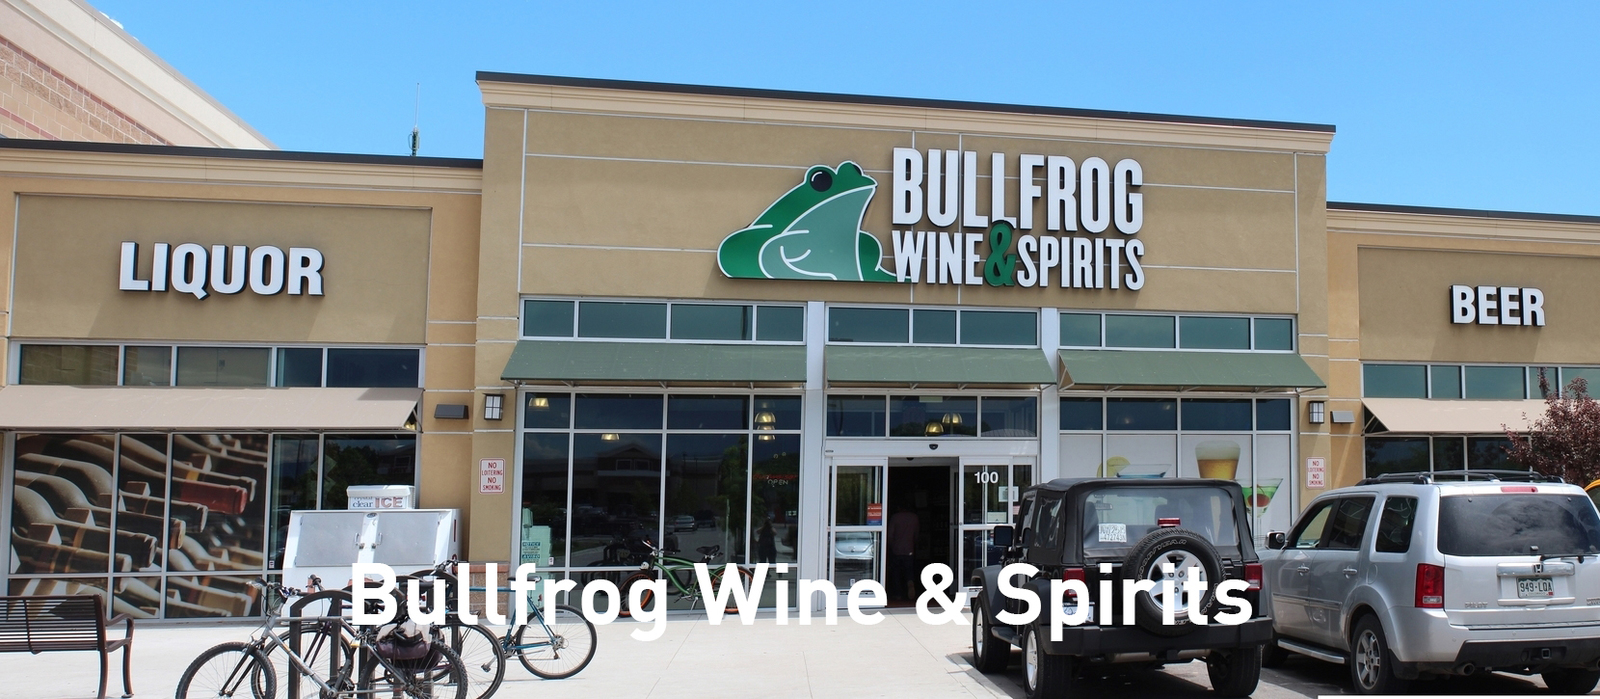 06_bullfrog_wine___spirits